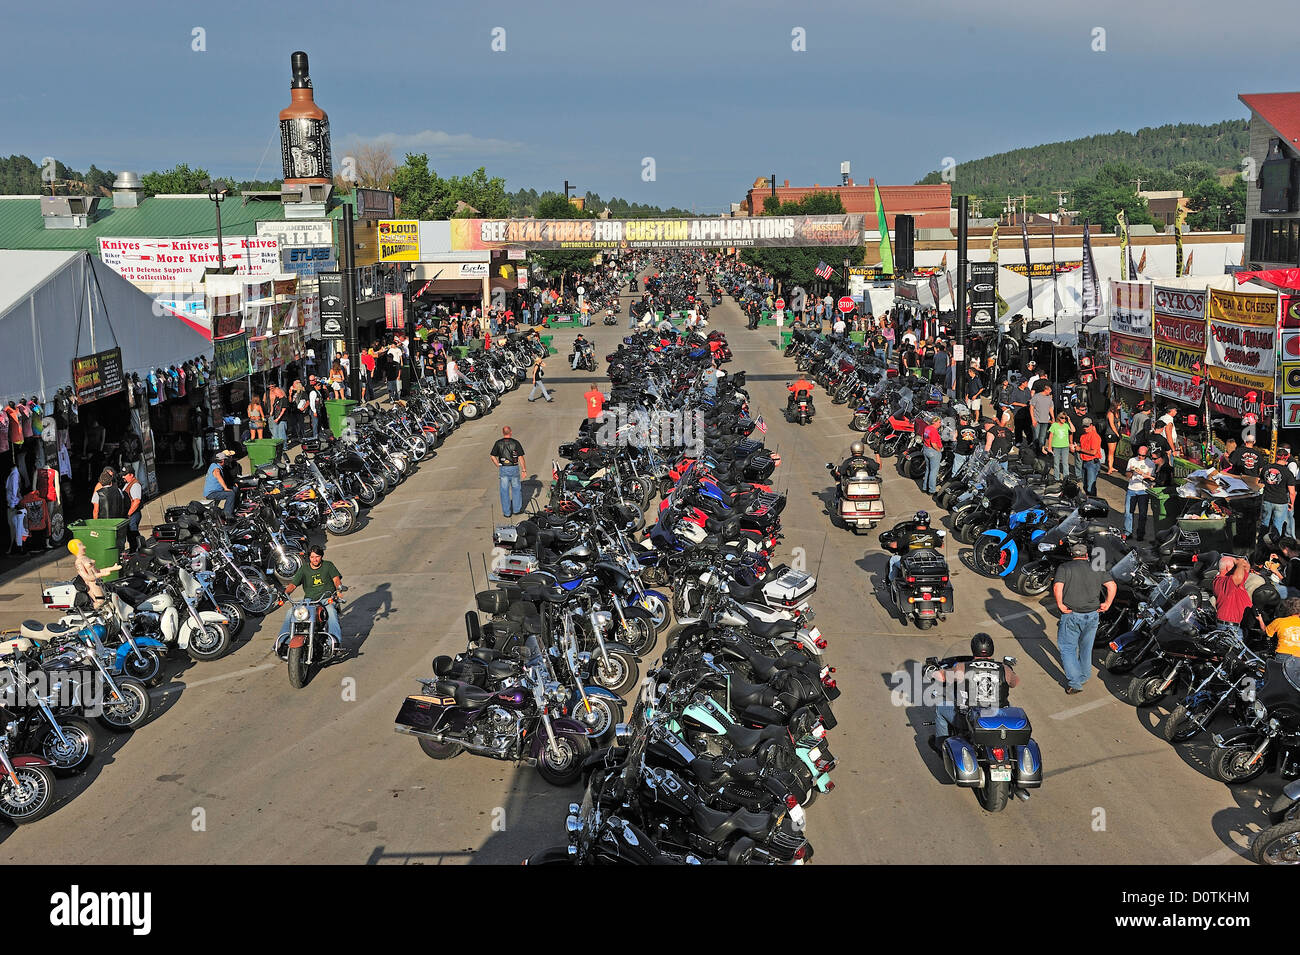 Bikes, bike, crowded, street, Harley, Harley Davidson, Motorcycle, Rally, downtown, Sturgis, South Dakota, USA, - Stock Image